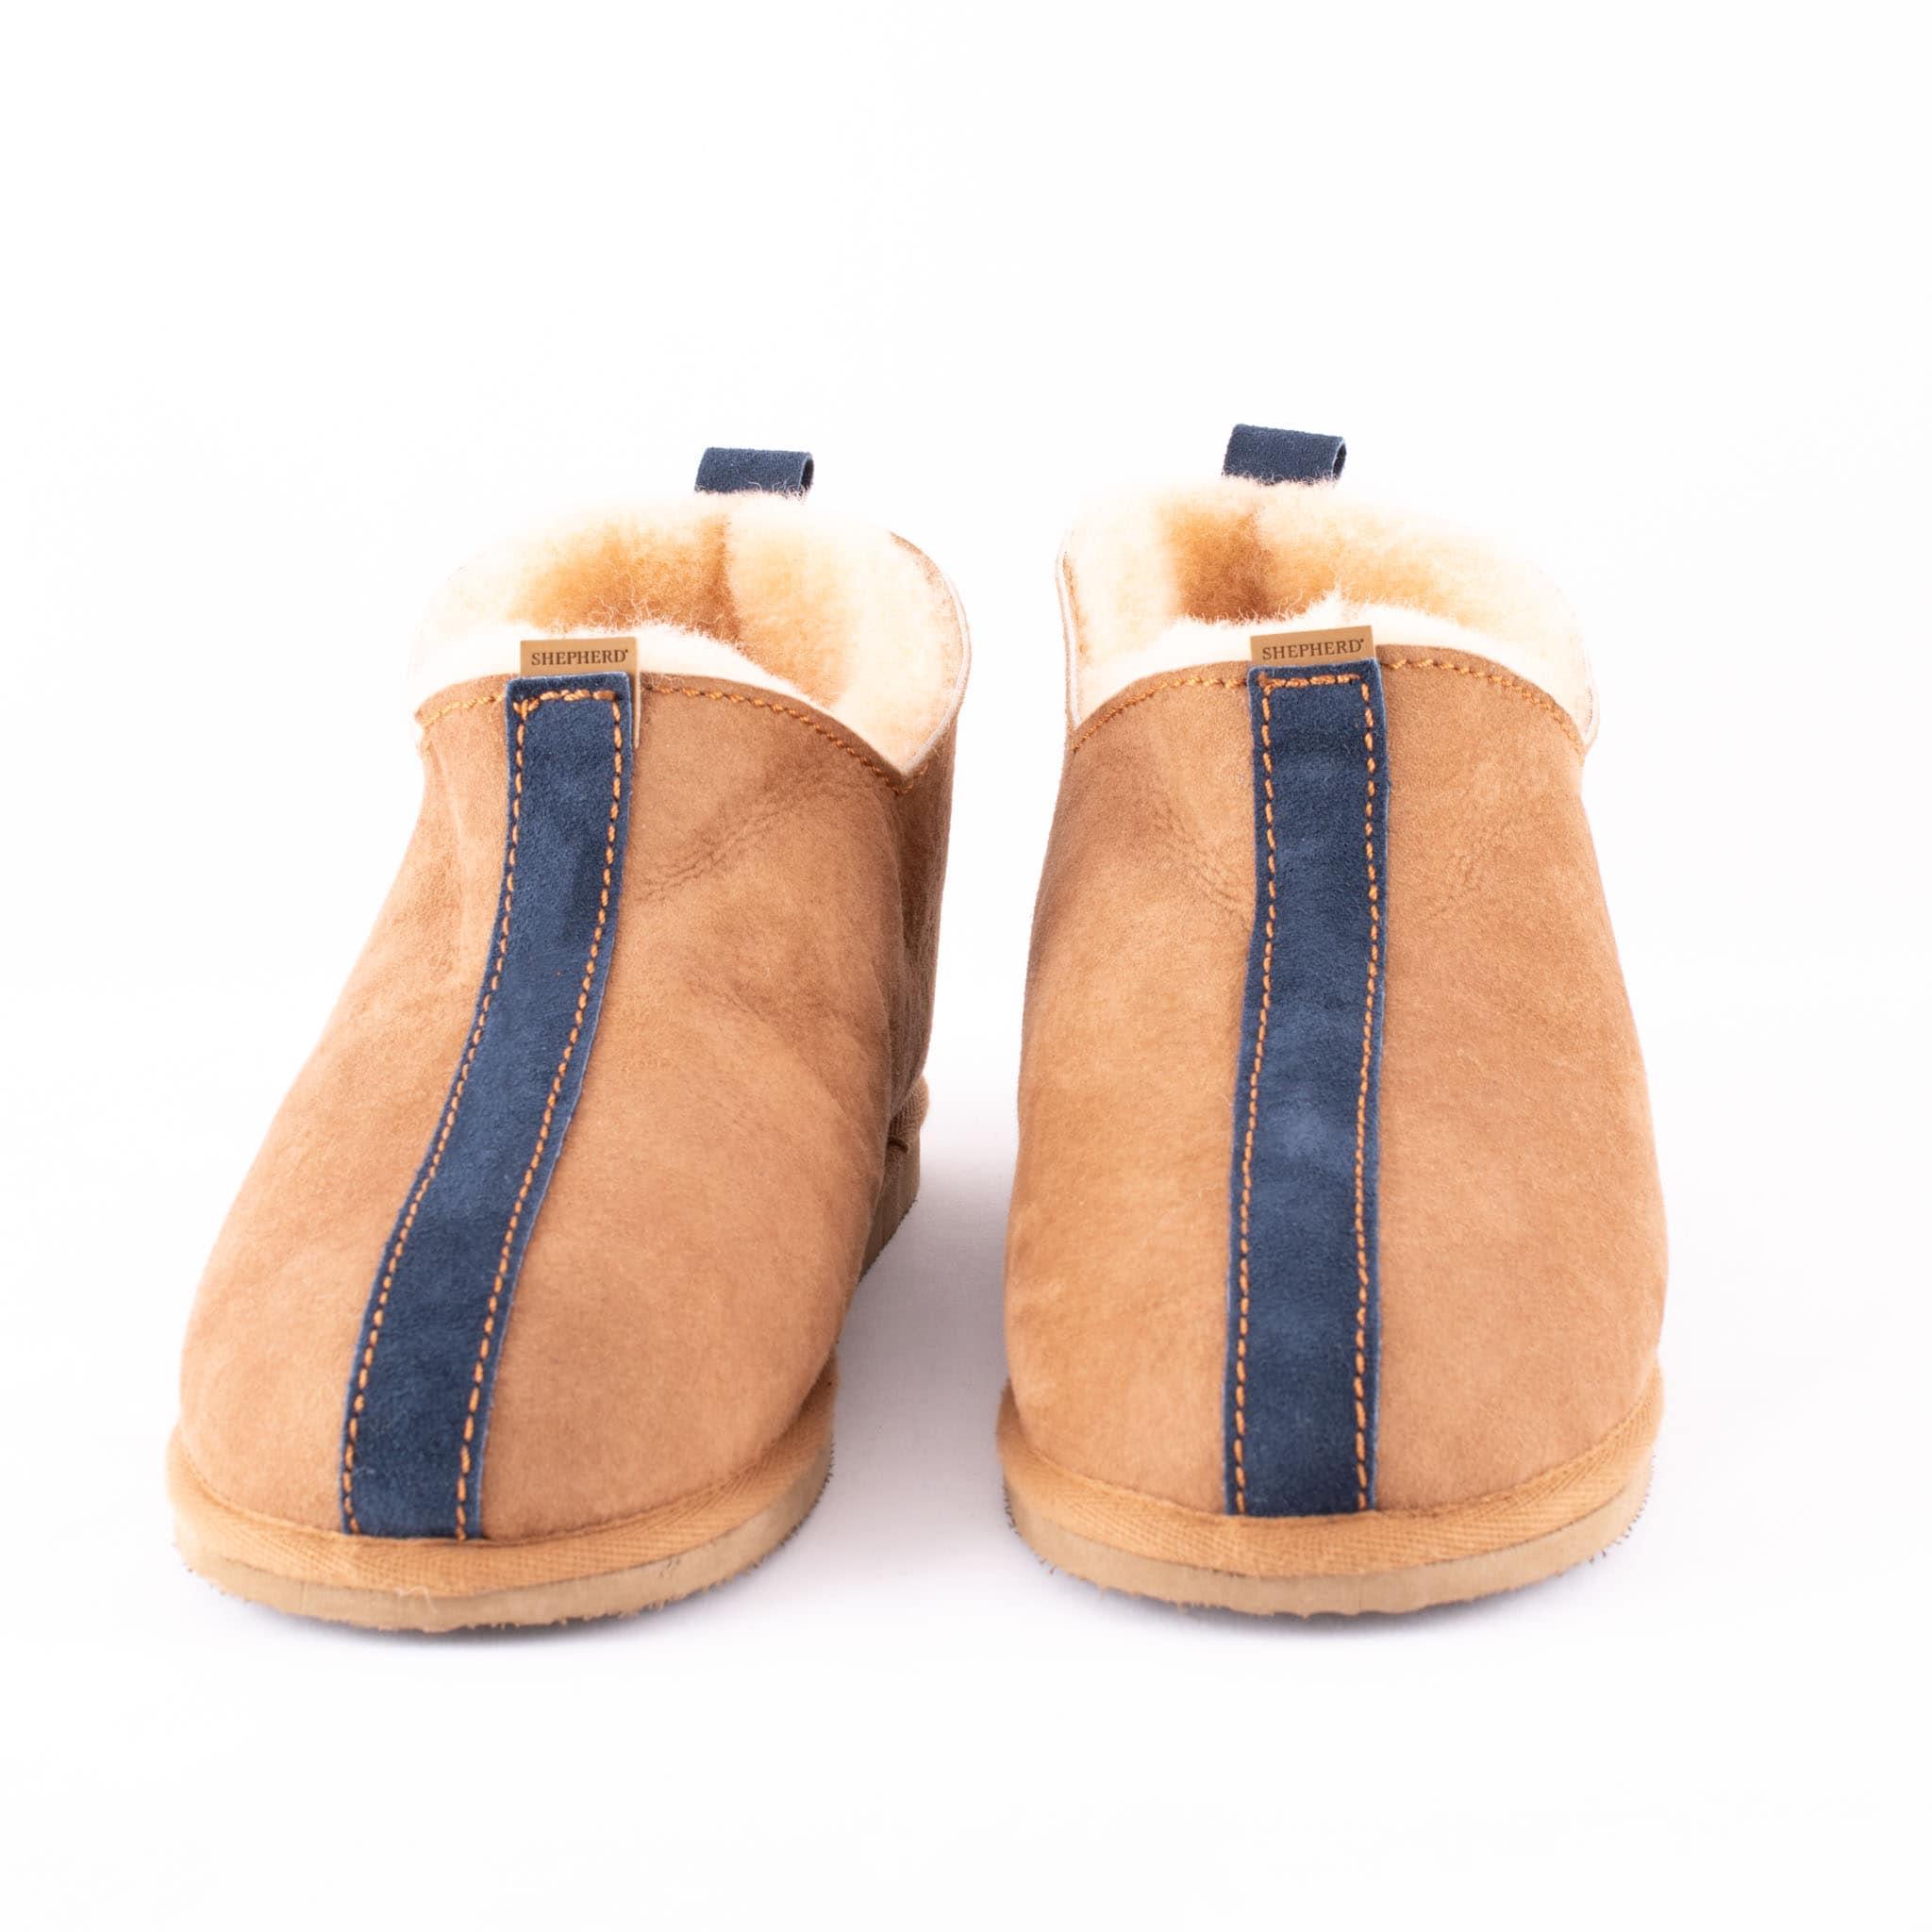 Shepherd Johannes slippers